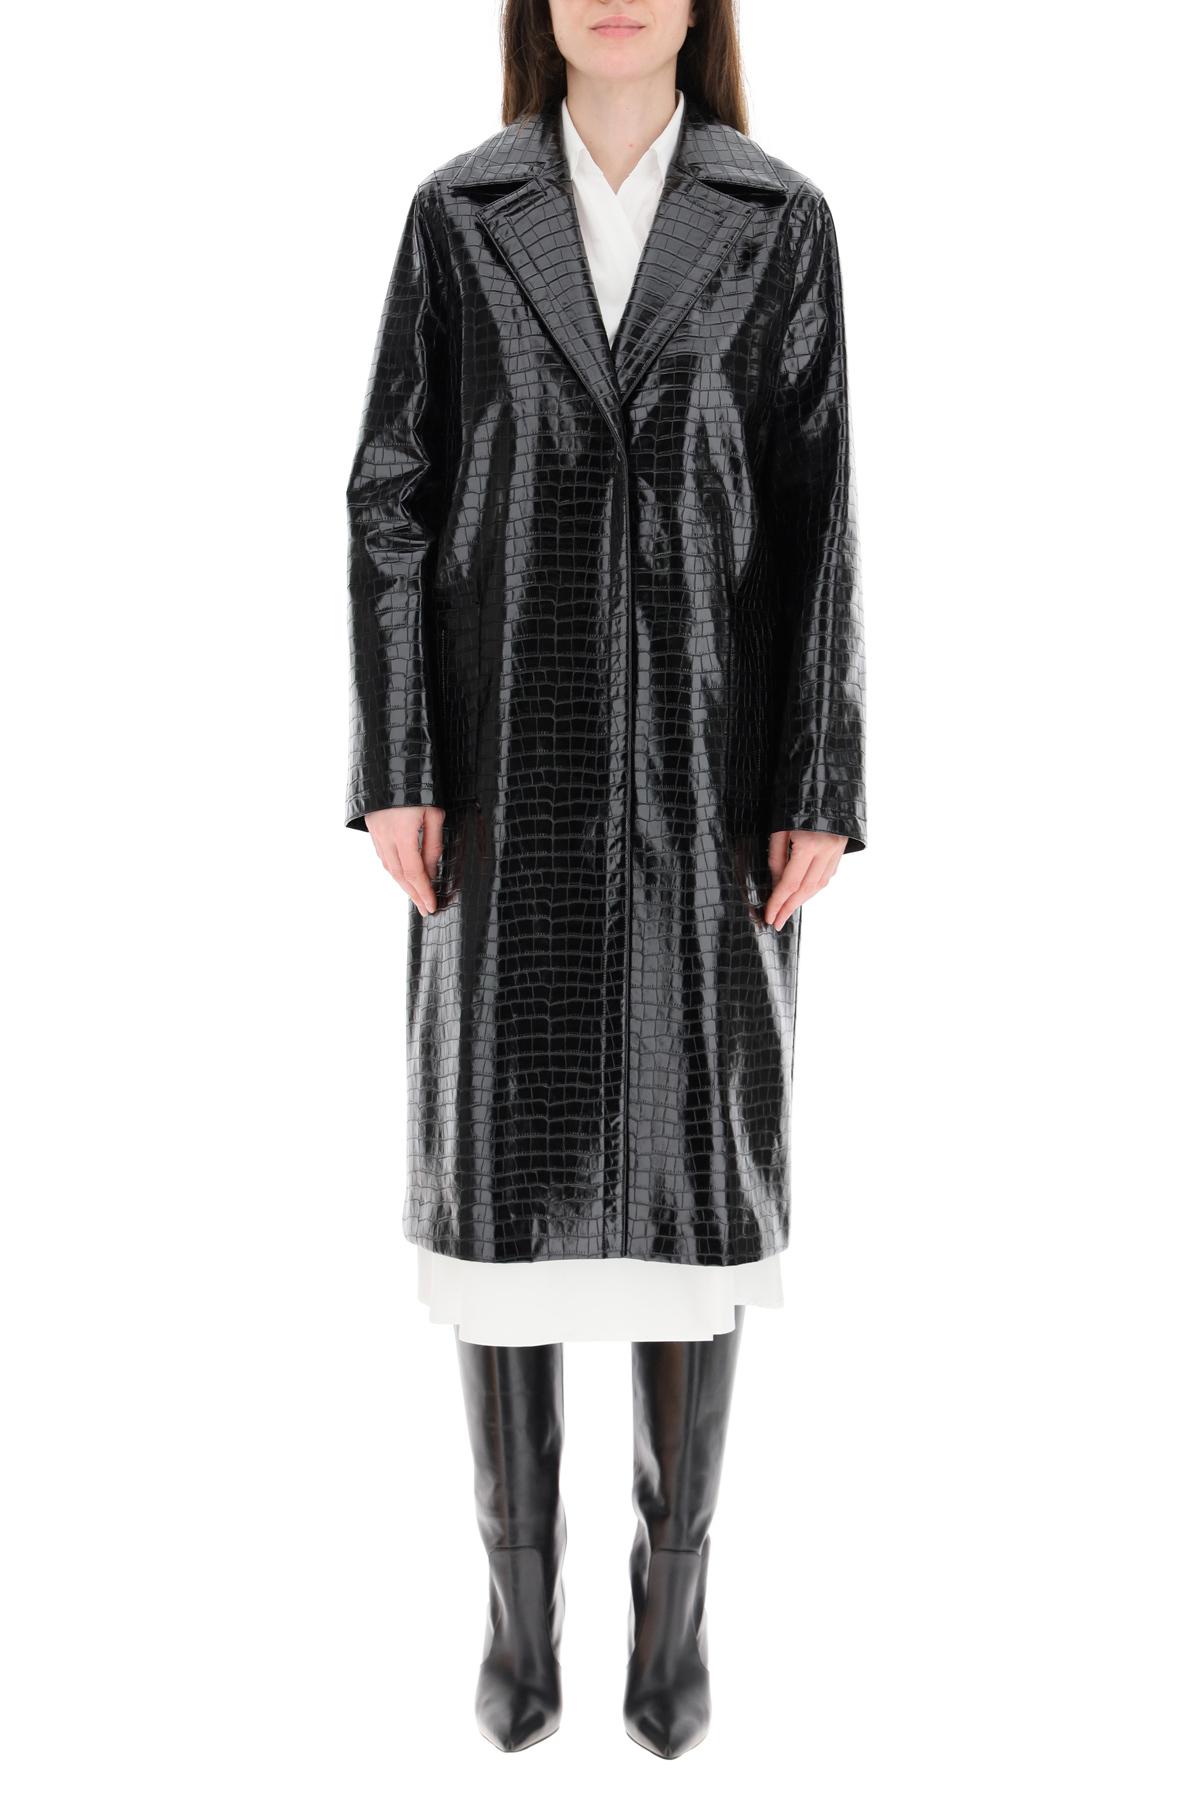 Stand cappotto emerson in ecopelle